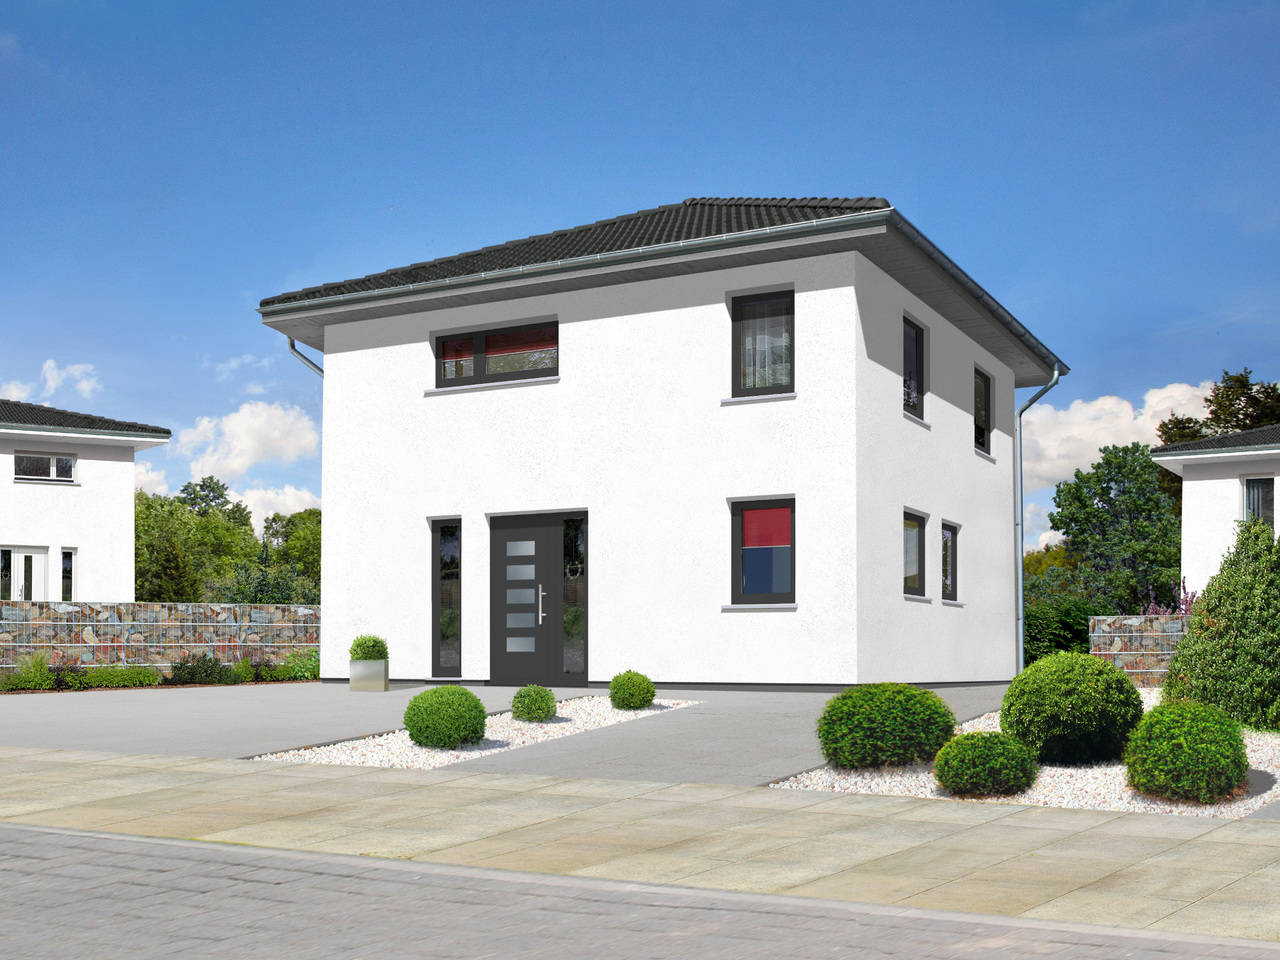 Stadthaus Flair 124 elegance A2 von ZuHause Bau GmbH - Town & Country